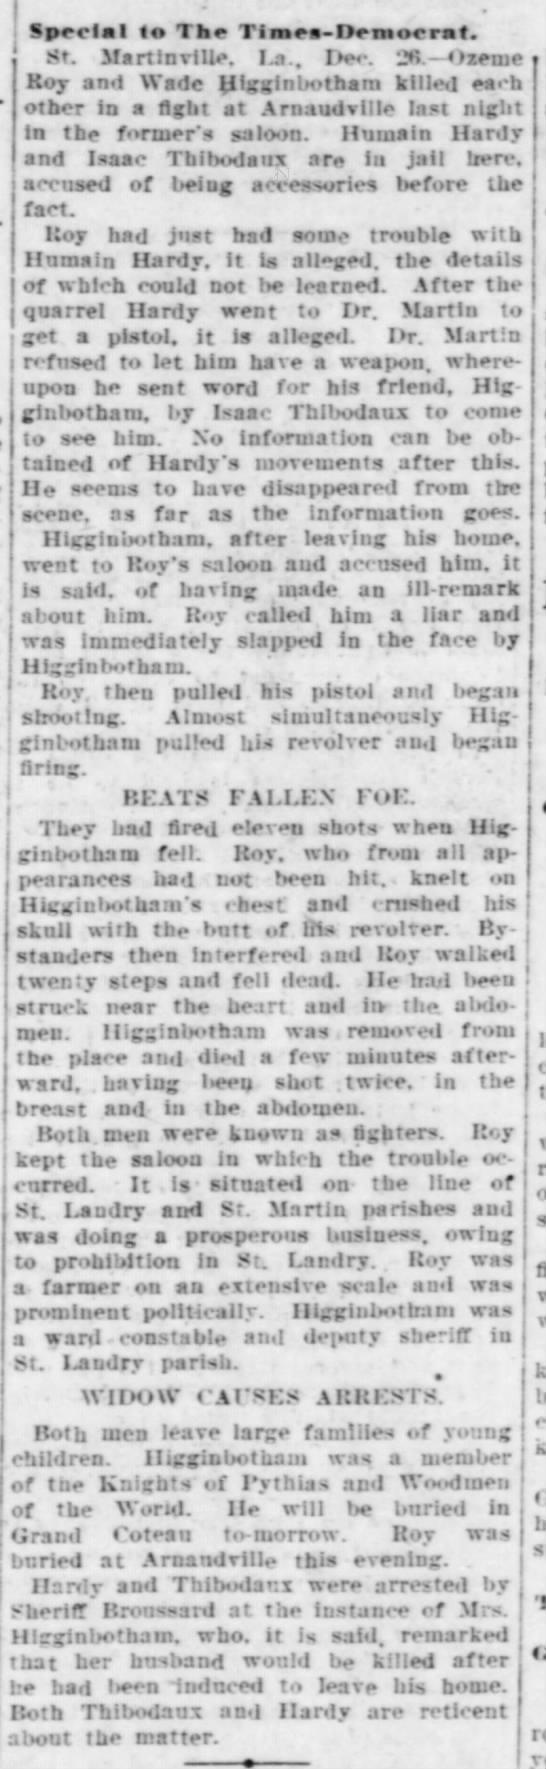 The Times-Democrat, New Orleans, LA - December 27, 1909